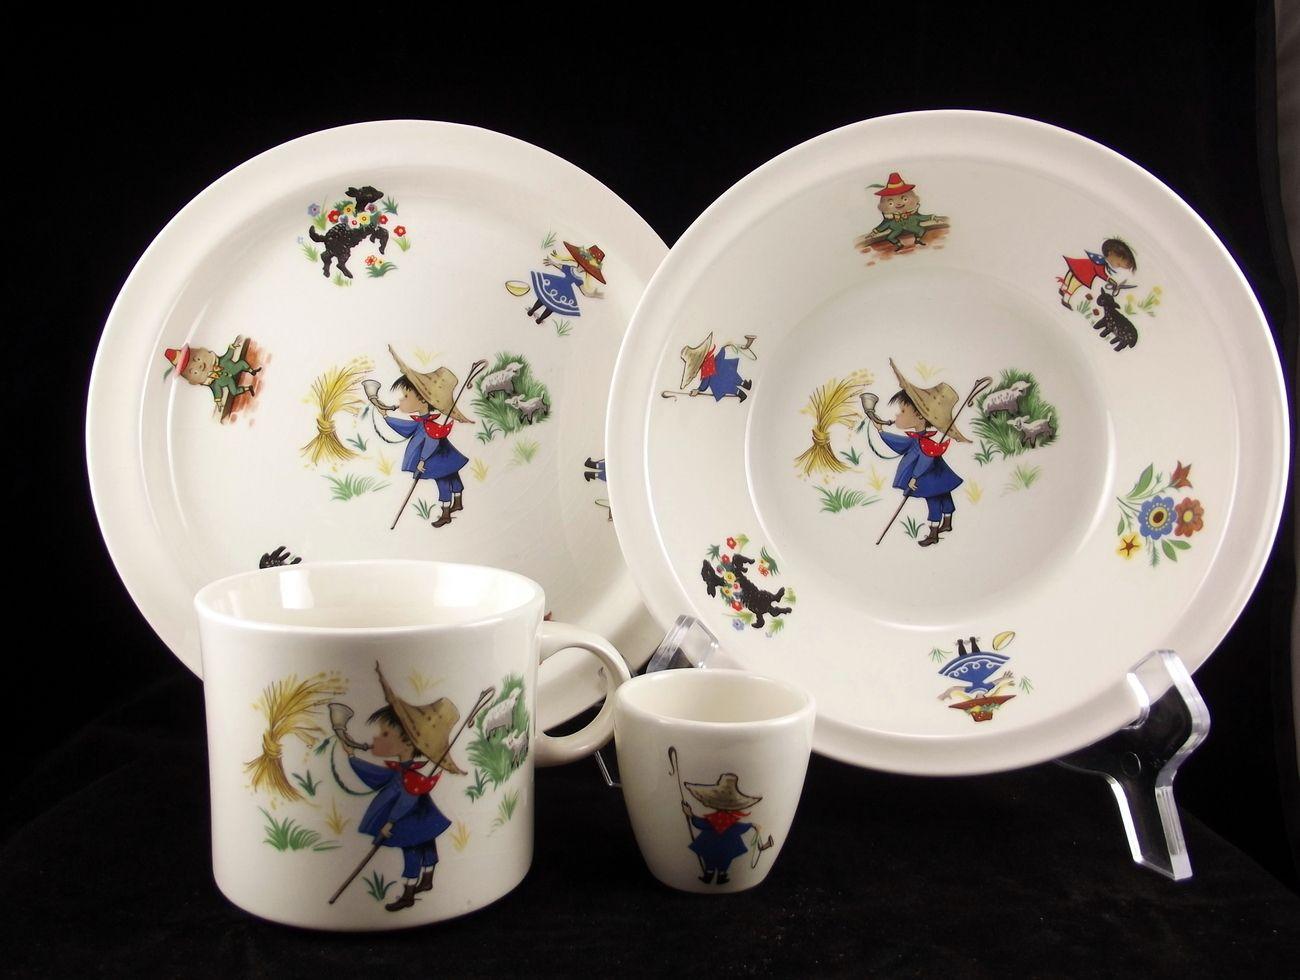 Vintage Arklow pottery Ireland childs dinnerware set $15.00 by celticecho on bonanza & Vintage Arklow Pottery Ireland child\u0027s dinnerware set 4 pieces ...